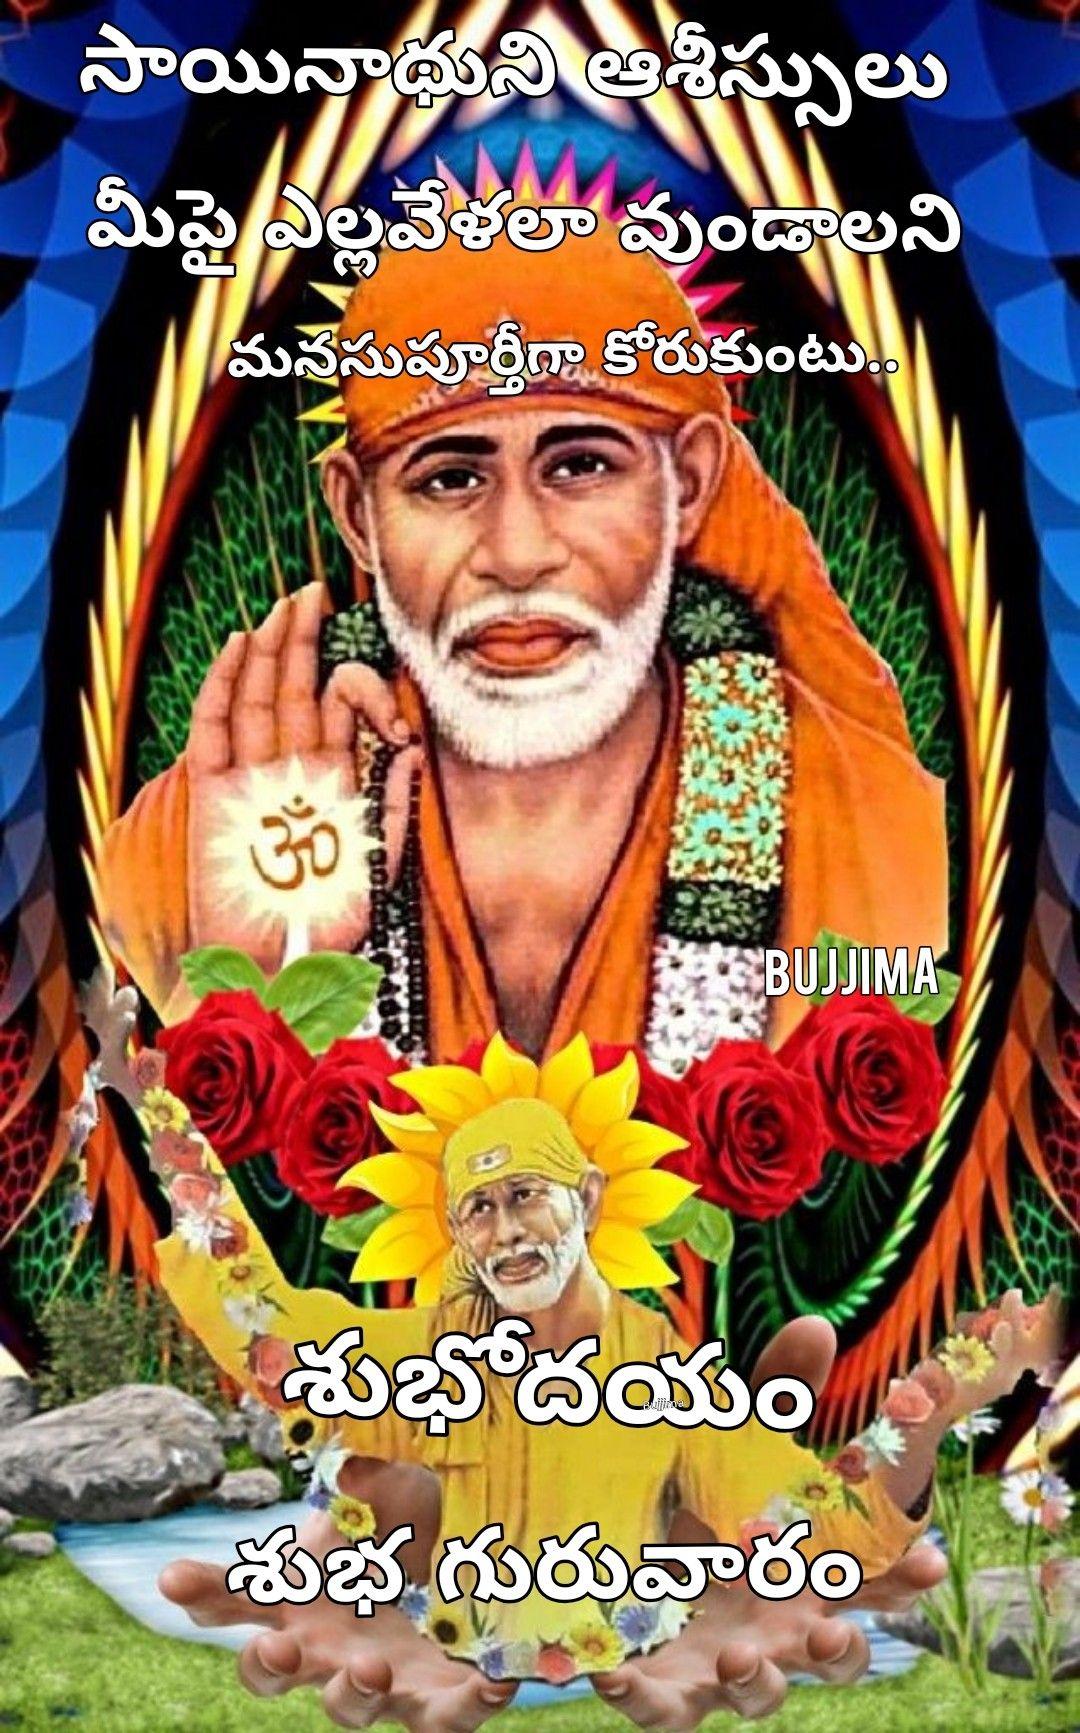 Pin By Bujjima Donepudi On Gm Thursday Beautiful Photos Of Nature Sathya Sai Baba Hindu Gods